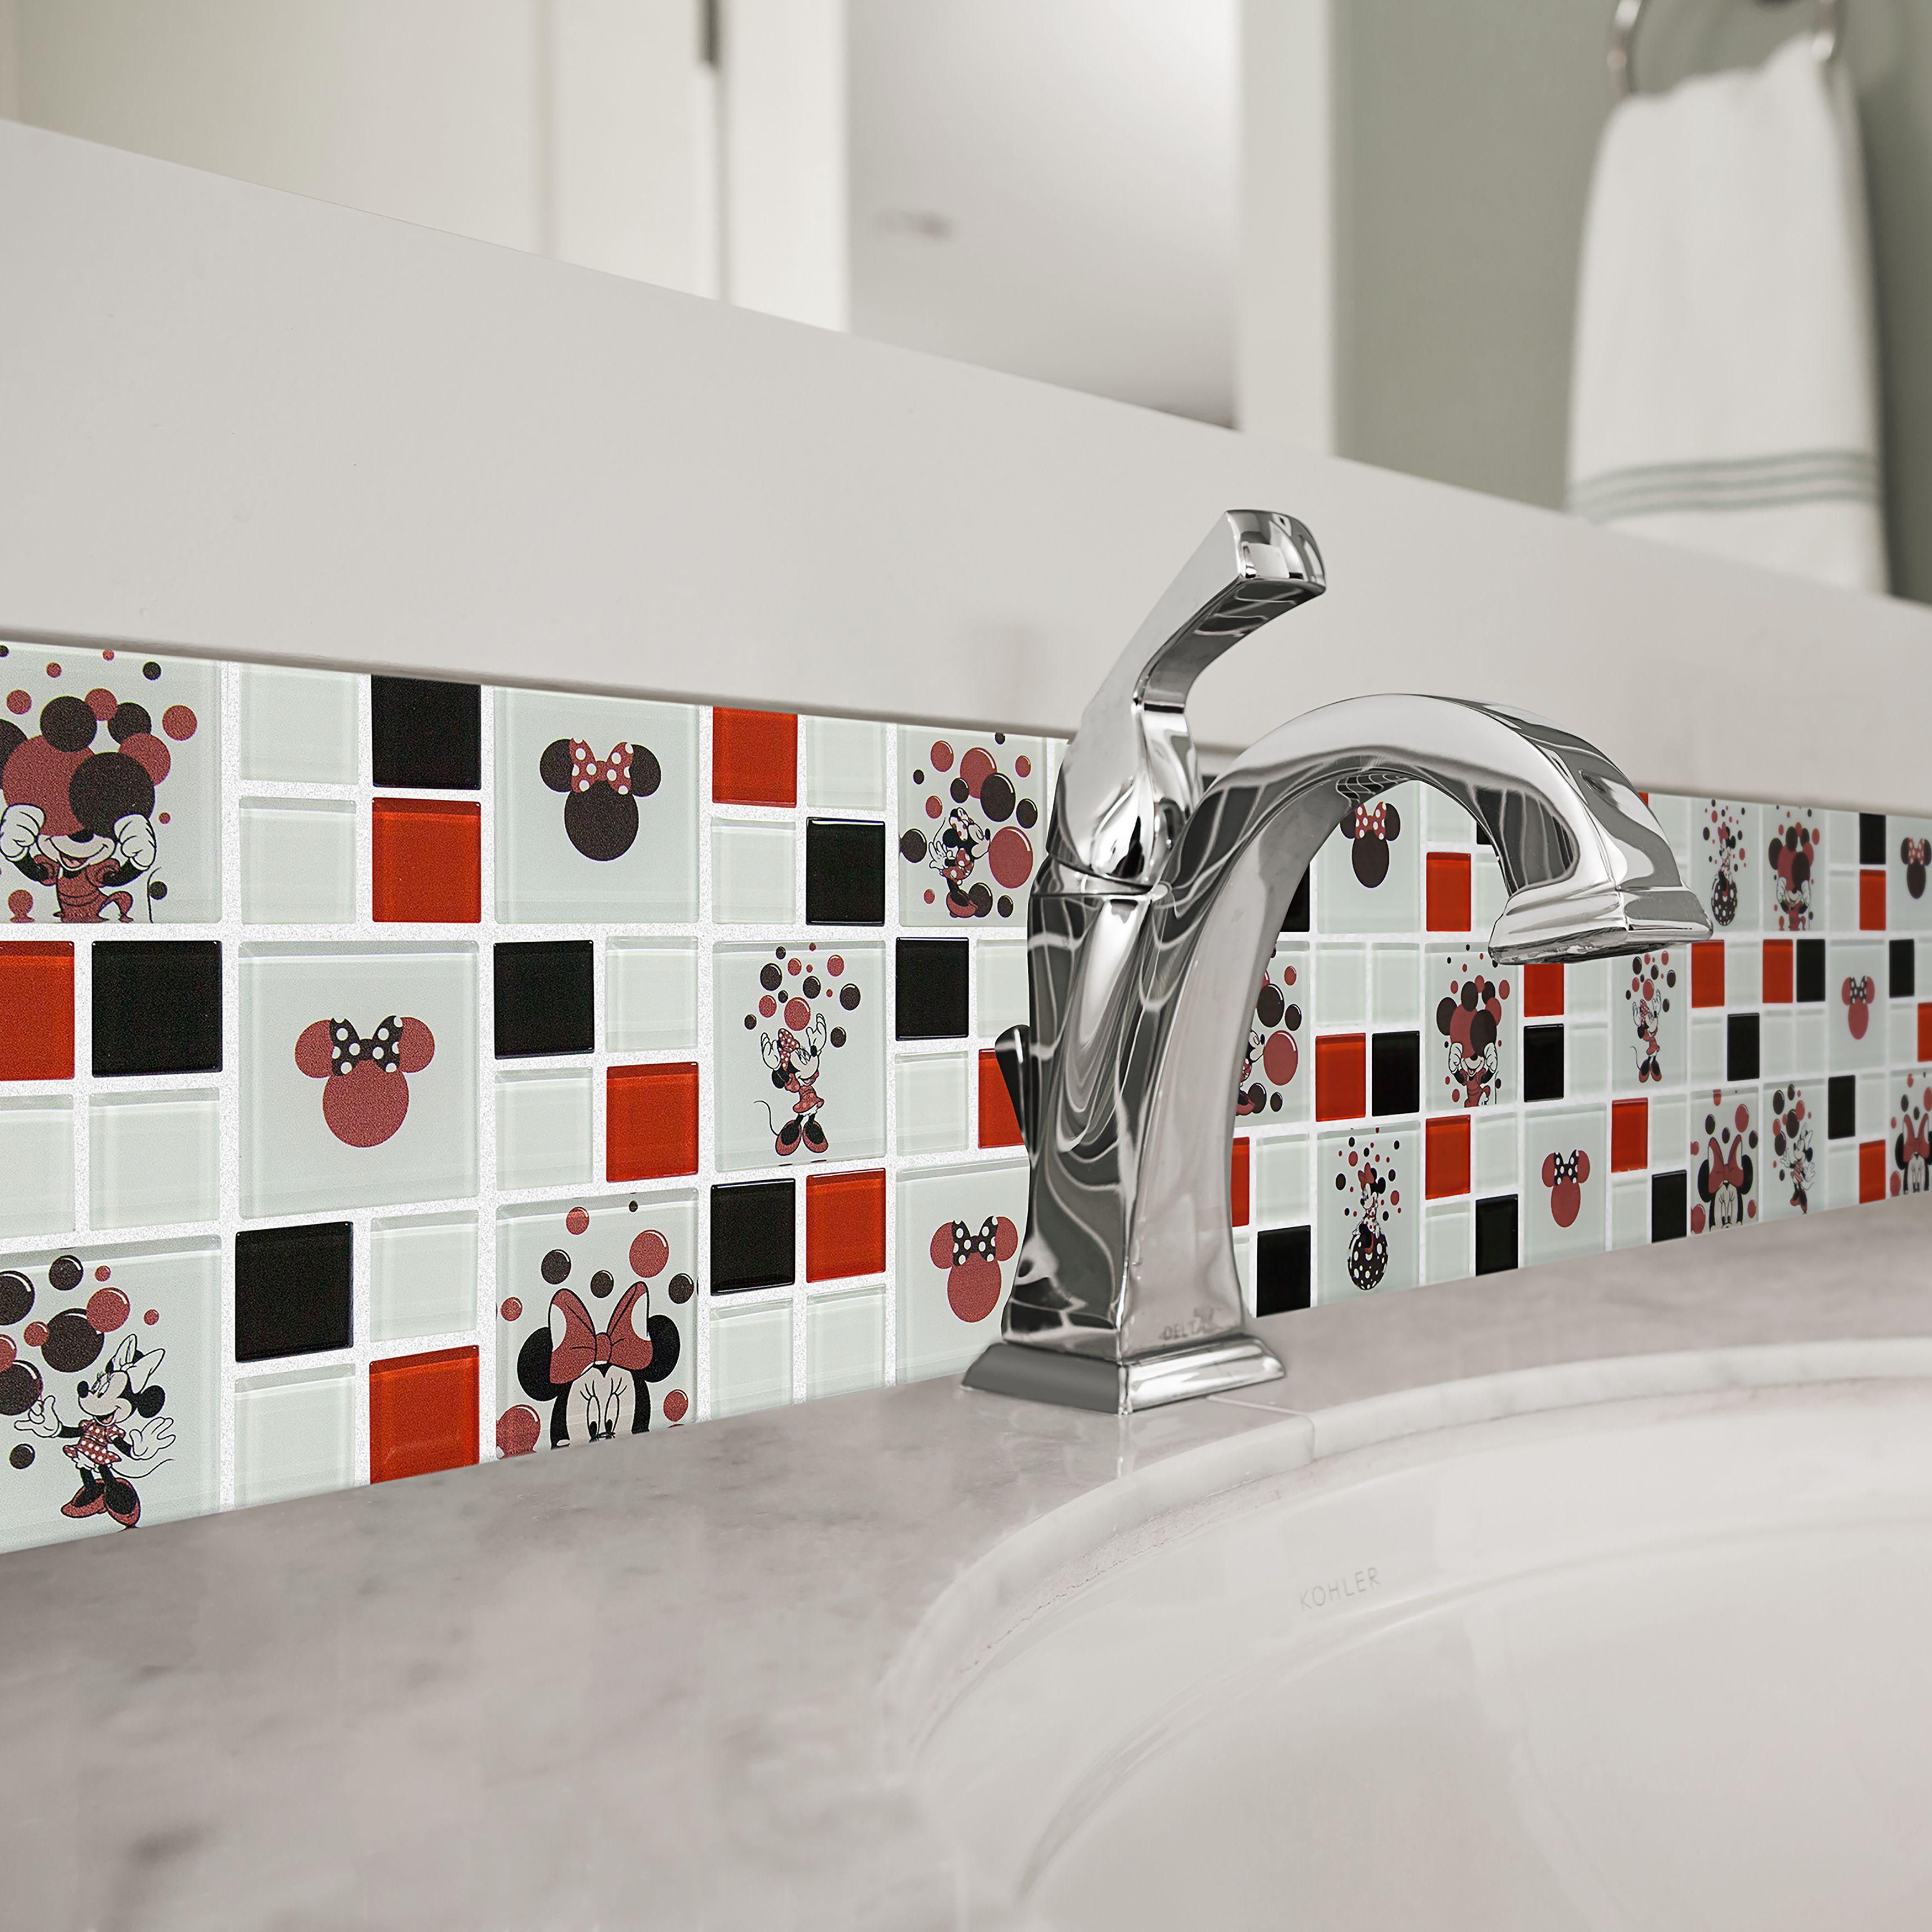 Disney 11.75x11.75-inch Minnie Red Mosaic Wall Tile   Homes/Home ...